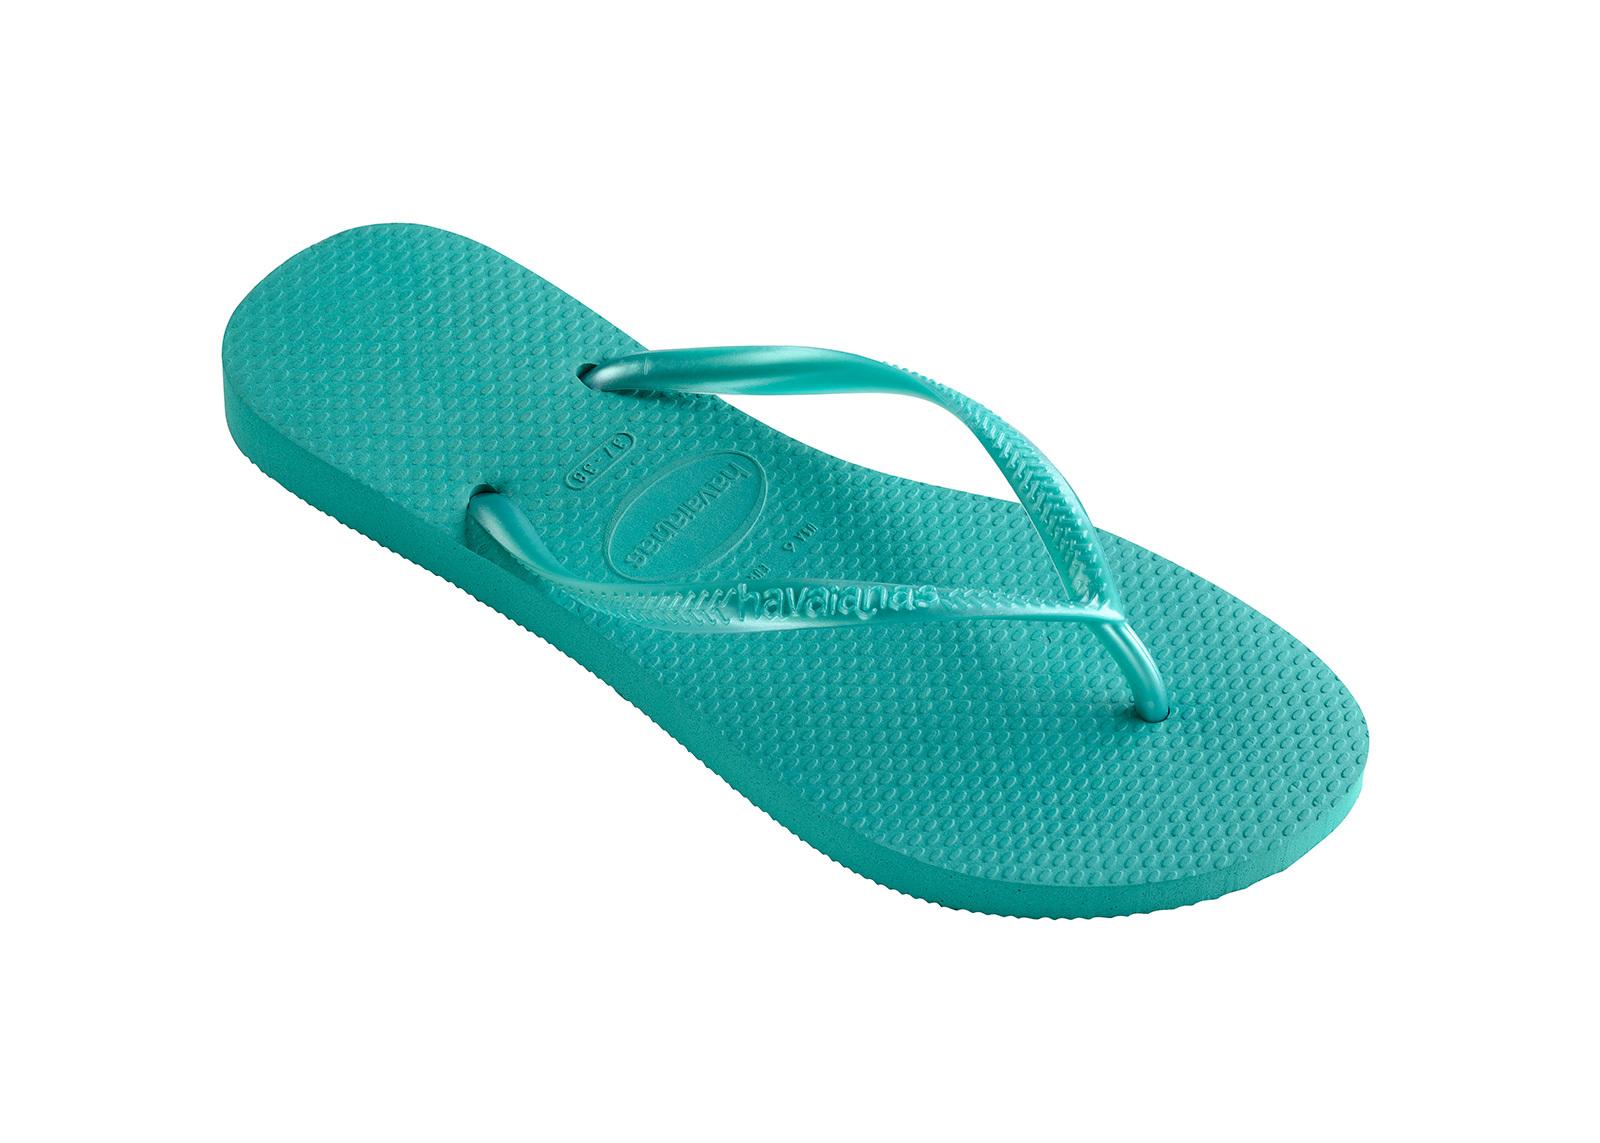 d923165d8e45 Havaianas Slim Brazil Women s Flip Flops and 50 similar items. 22